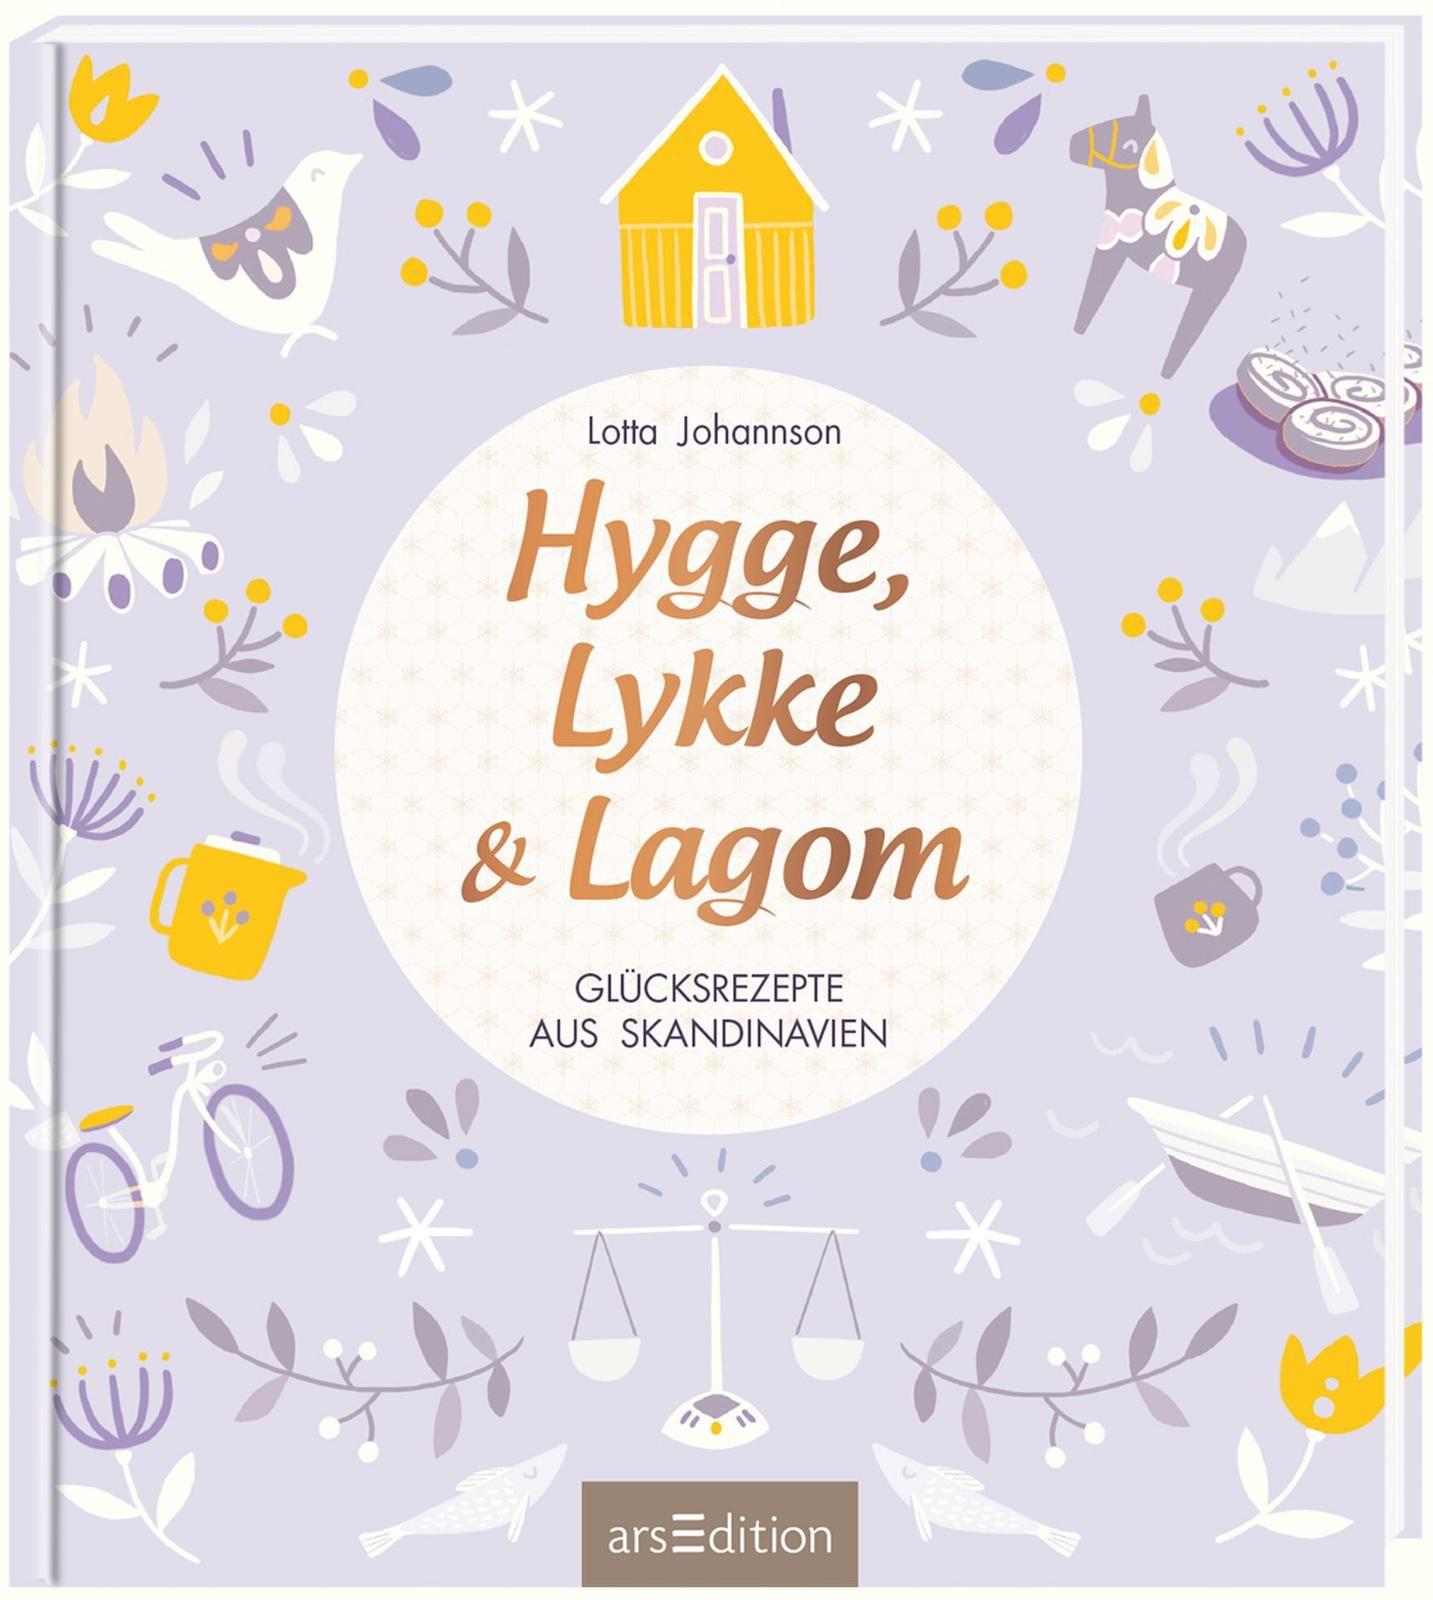 Hygge, Lykke & Lagom